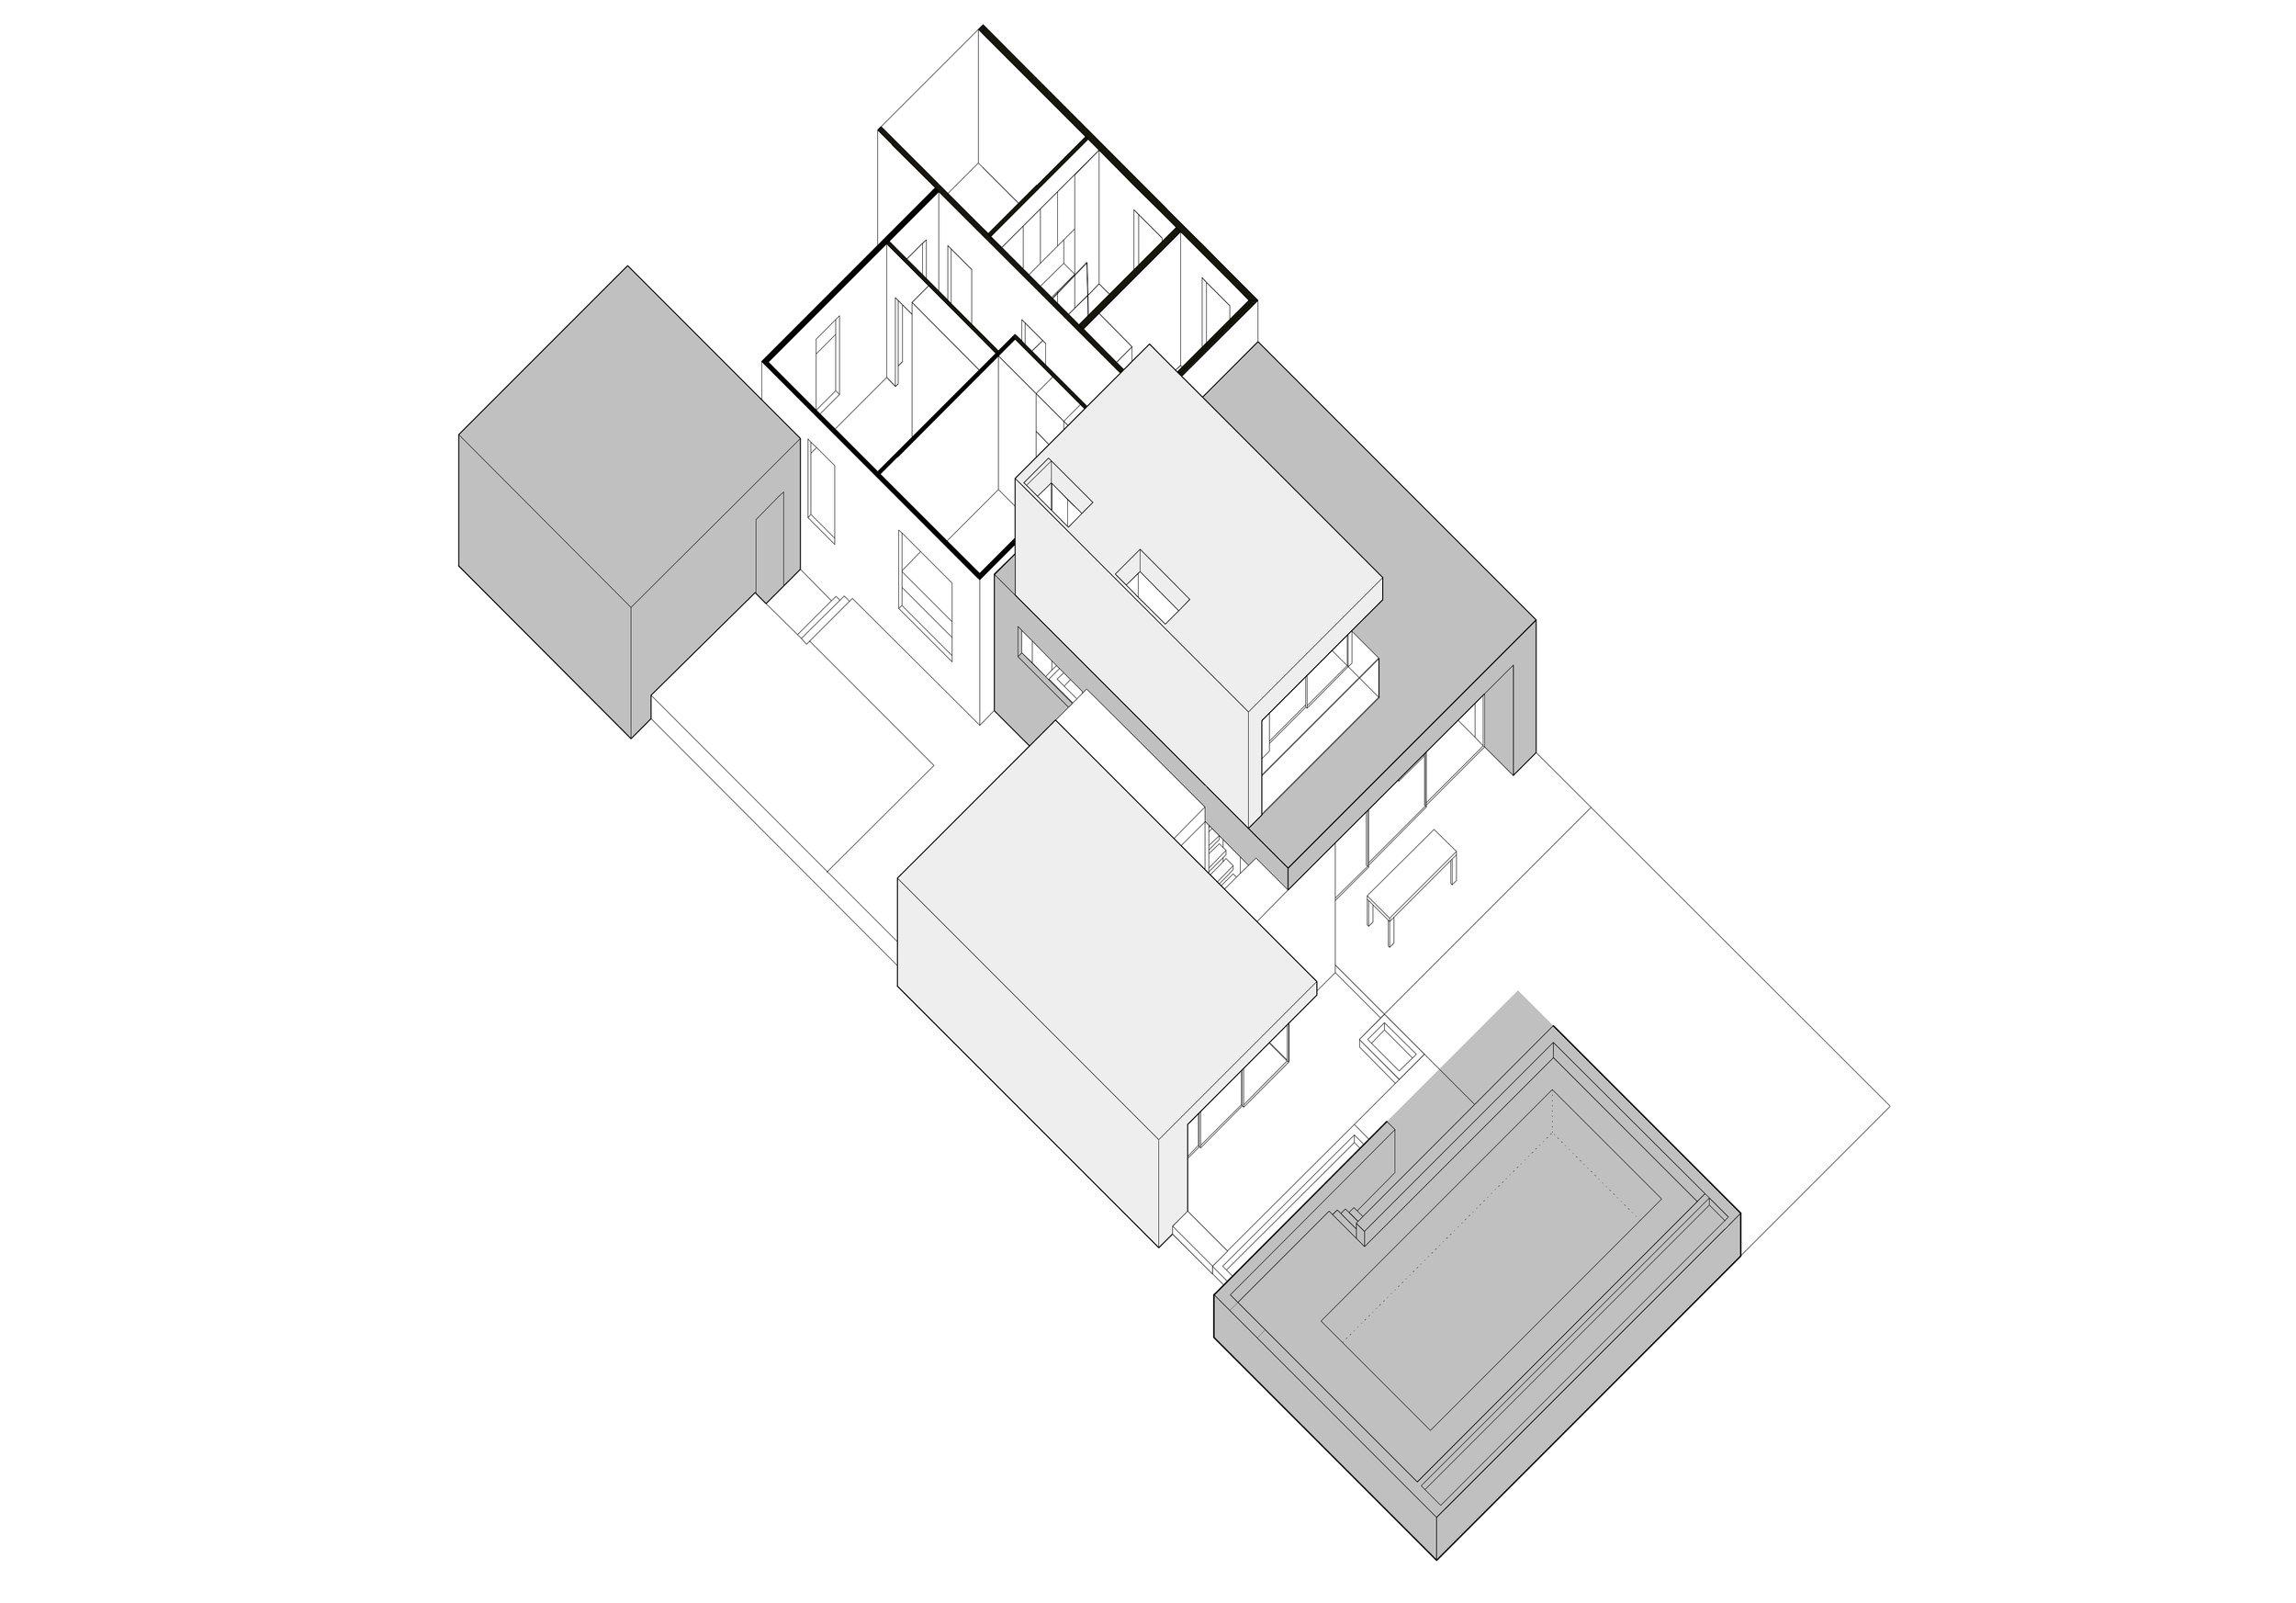 WTAD_Case Study Villa_AXO 04'.jpg